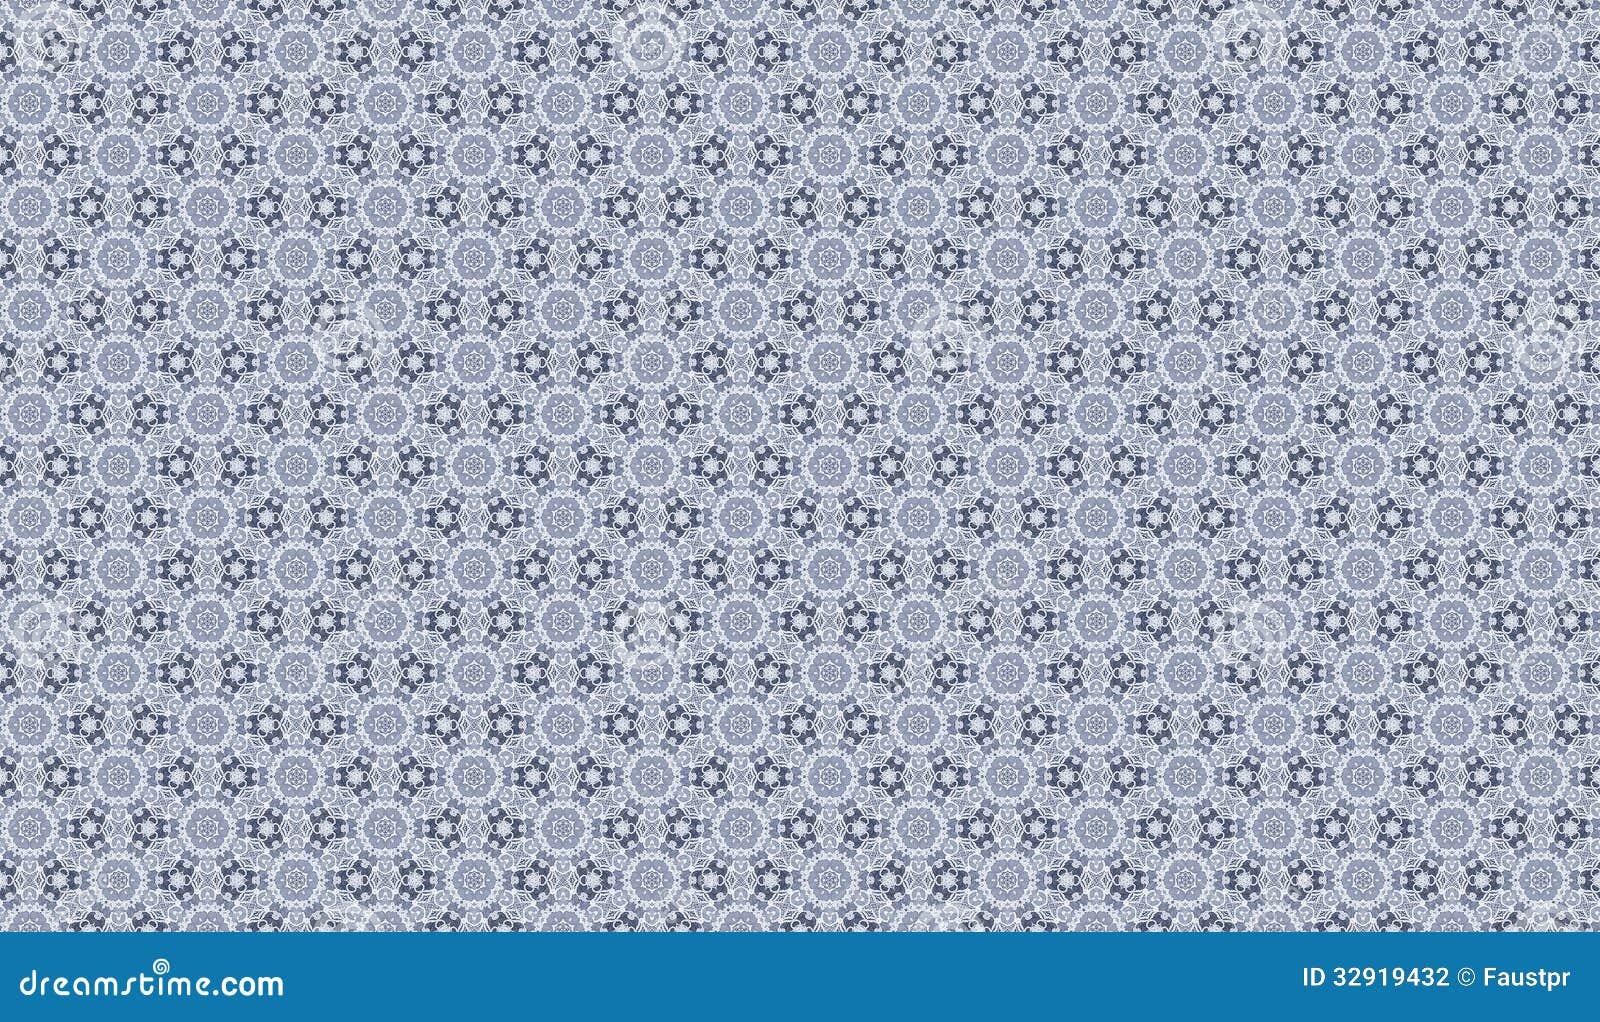 lace background tile - photo #10